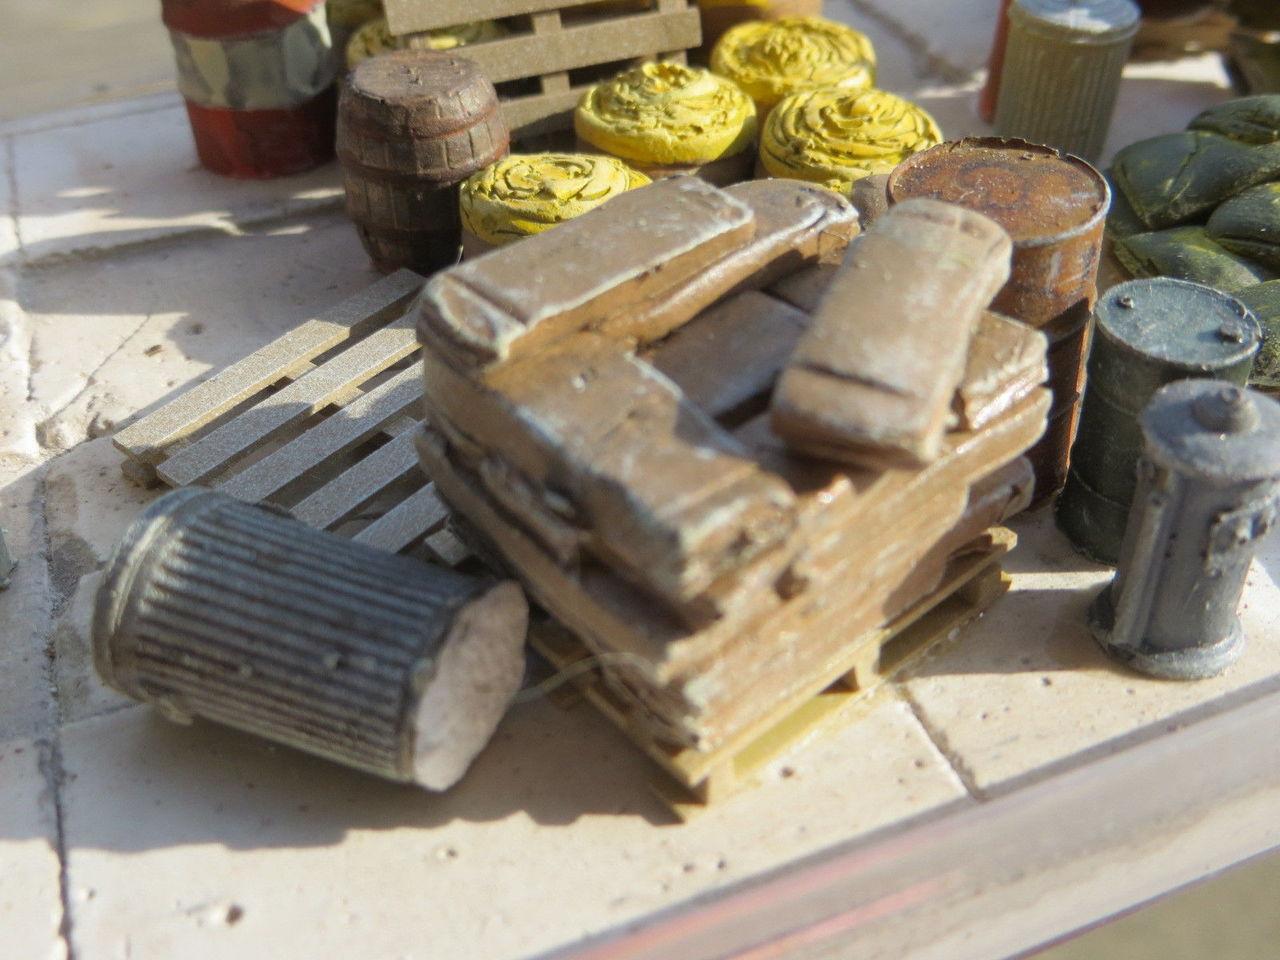 48-3005 Shingles Bundles O ON3 Scale Resin Casting Details